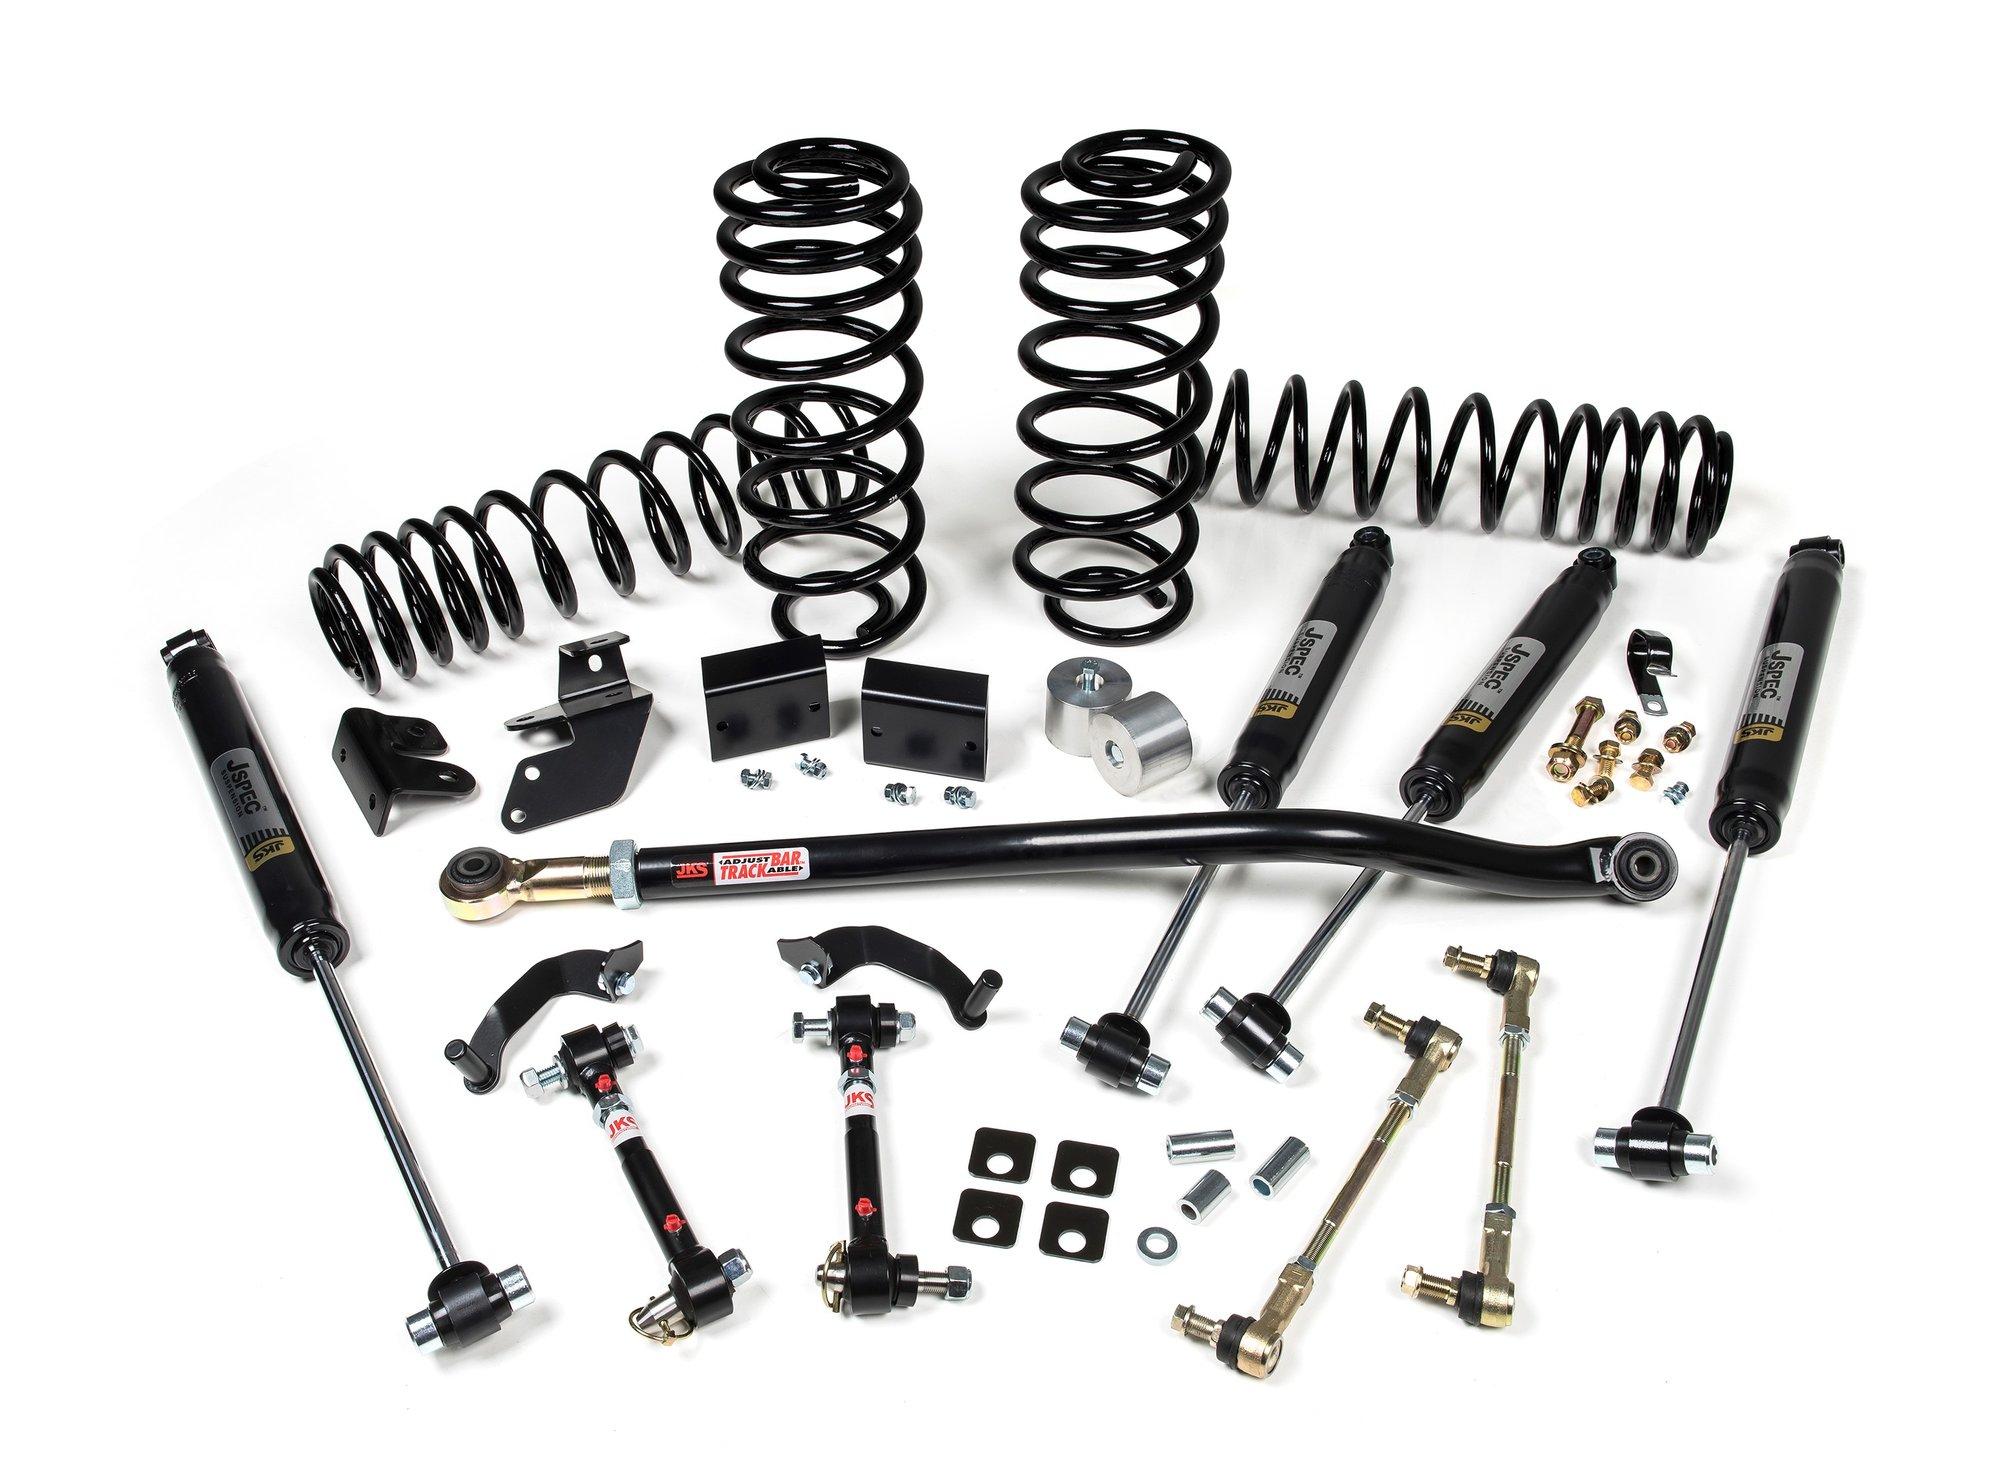 Jks Manufacturing 2 5 Jspec Heavy Duty Lift Kit For 18 19